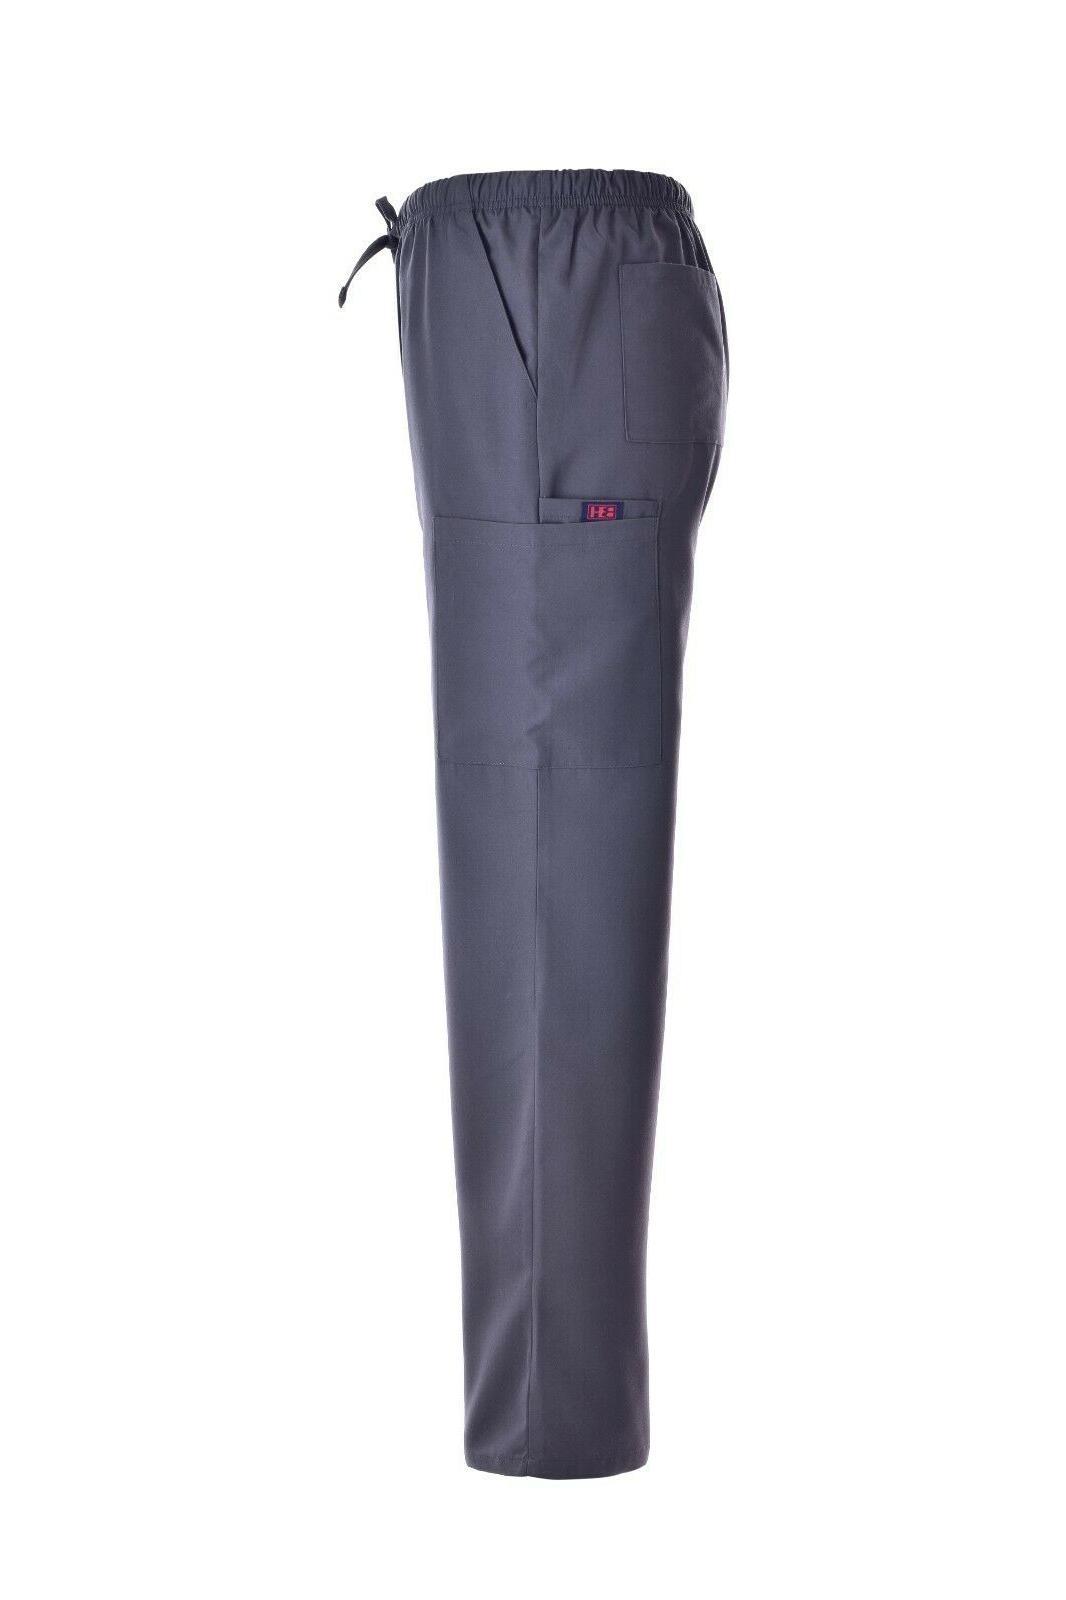 Unisex Sets V-Neck Cargo Men Nursing Uniform